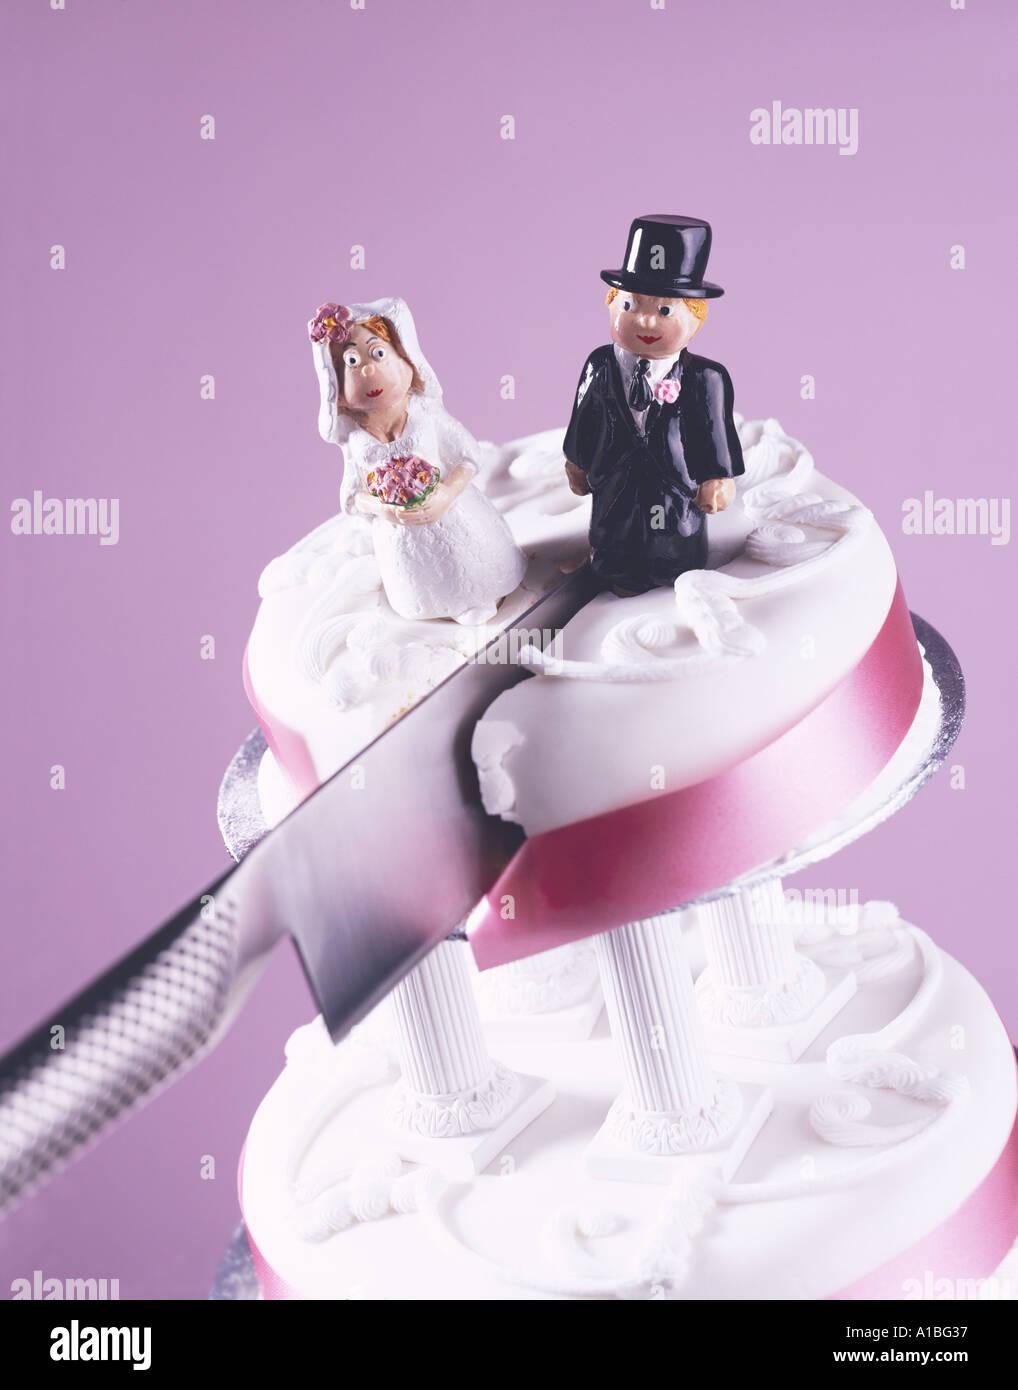 Divorce - Stock Image